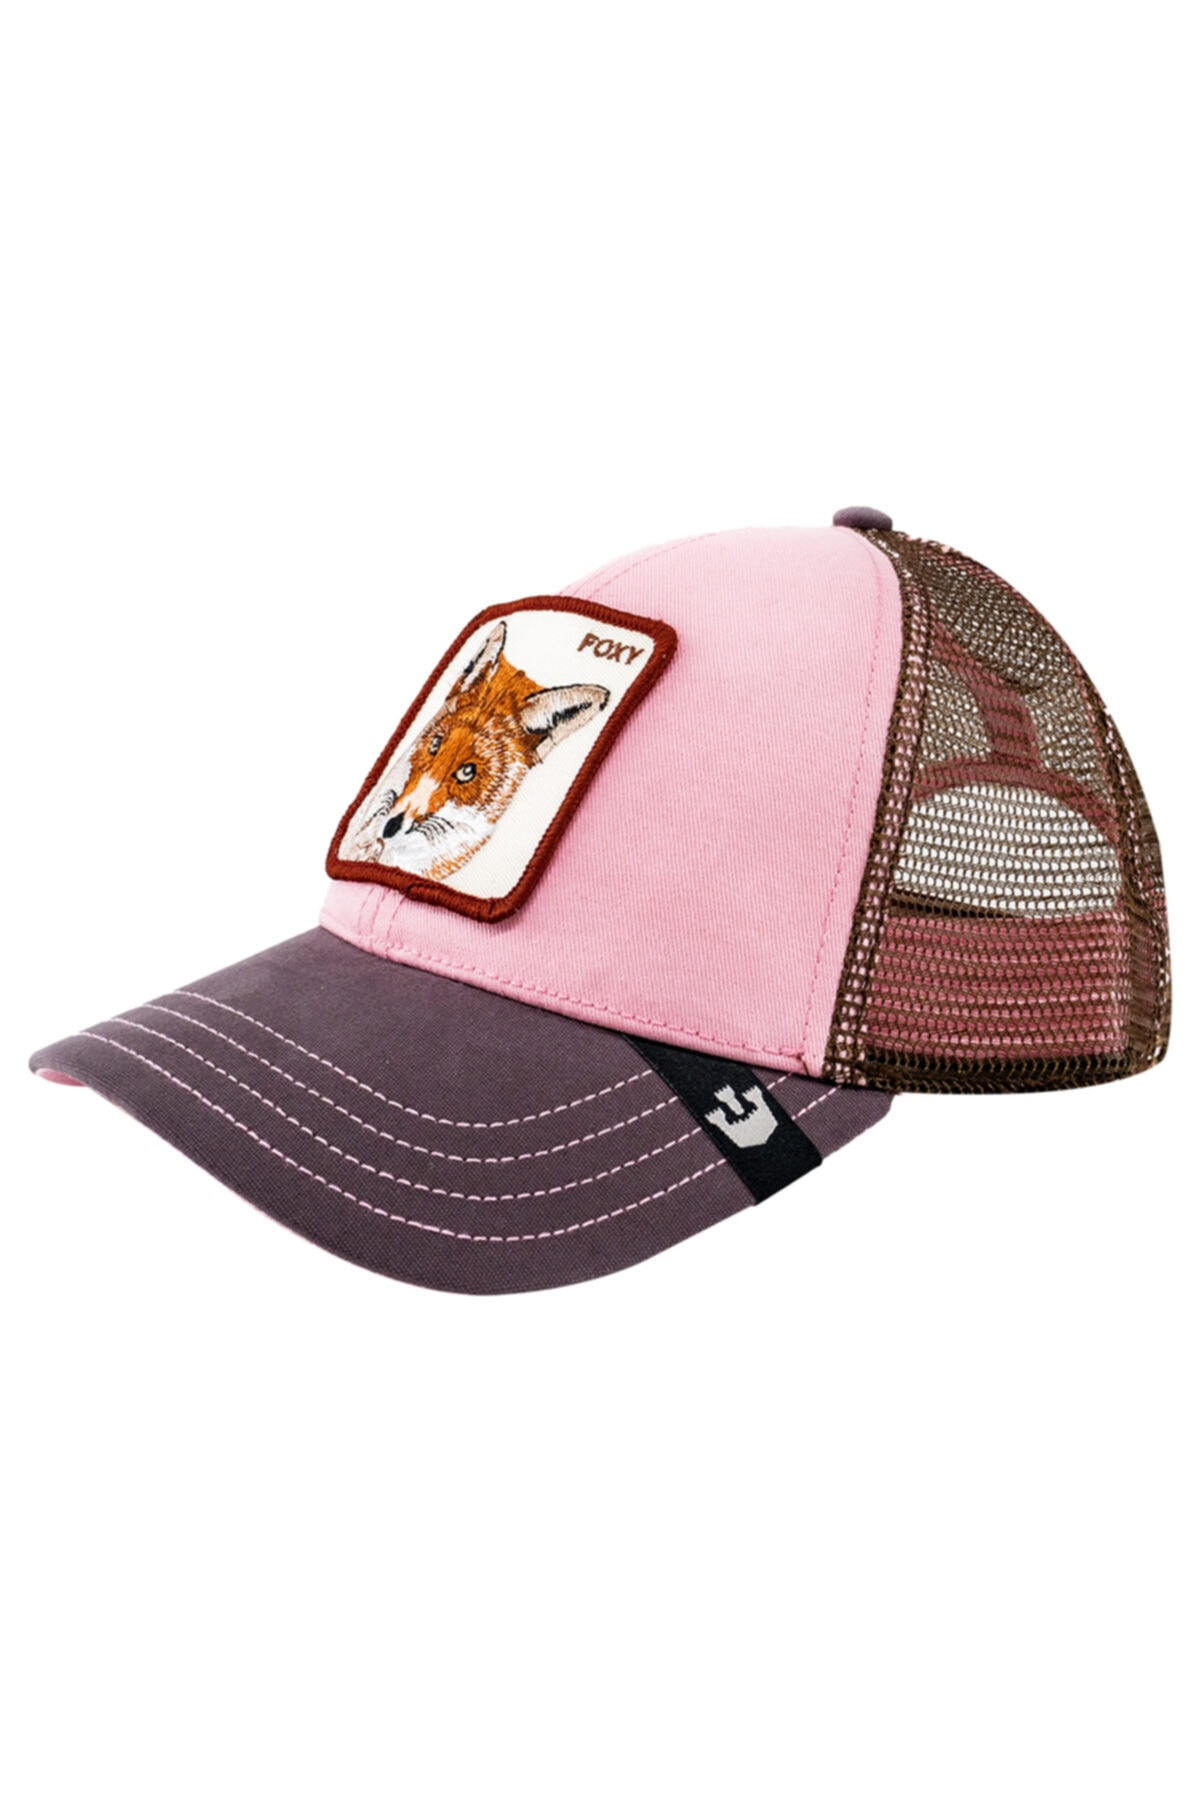 Goorin Bros Unisex Pembe Foxy Baby Şapka 101-2152 1